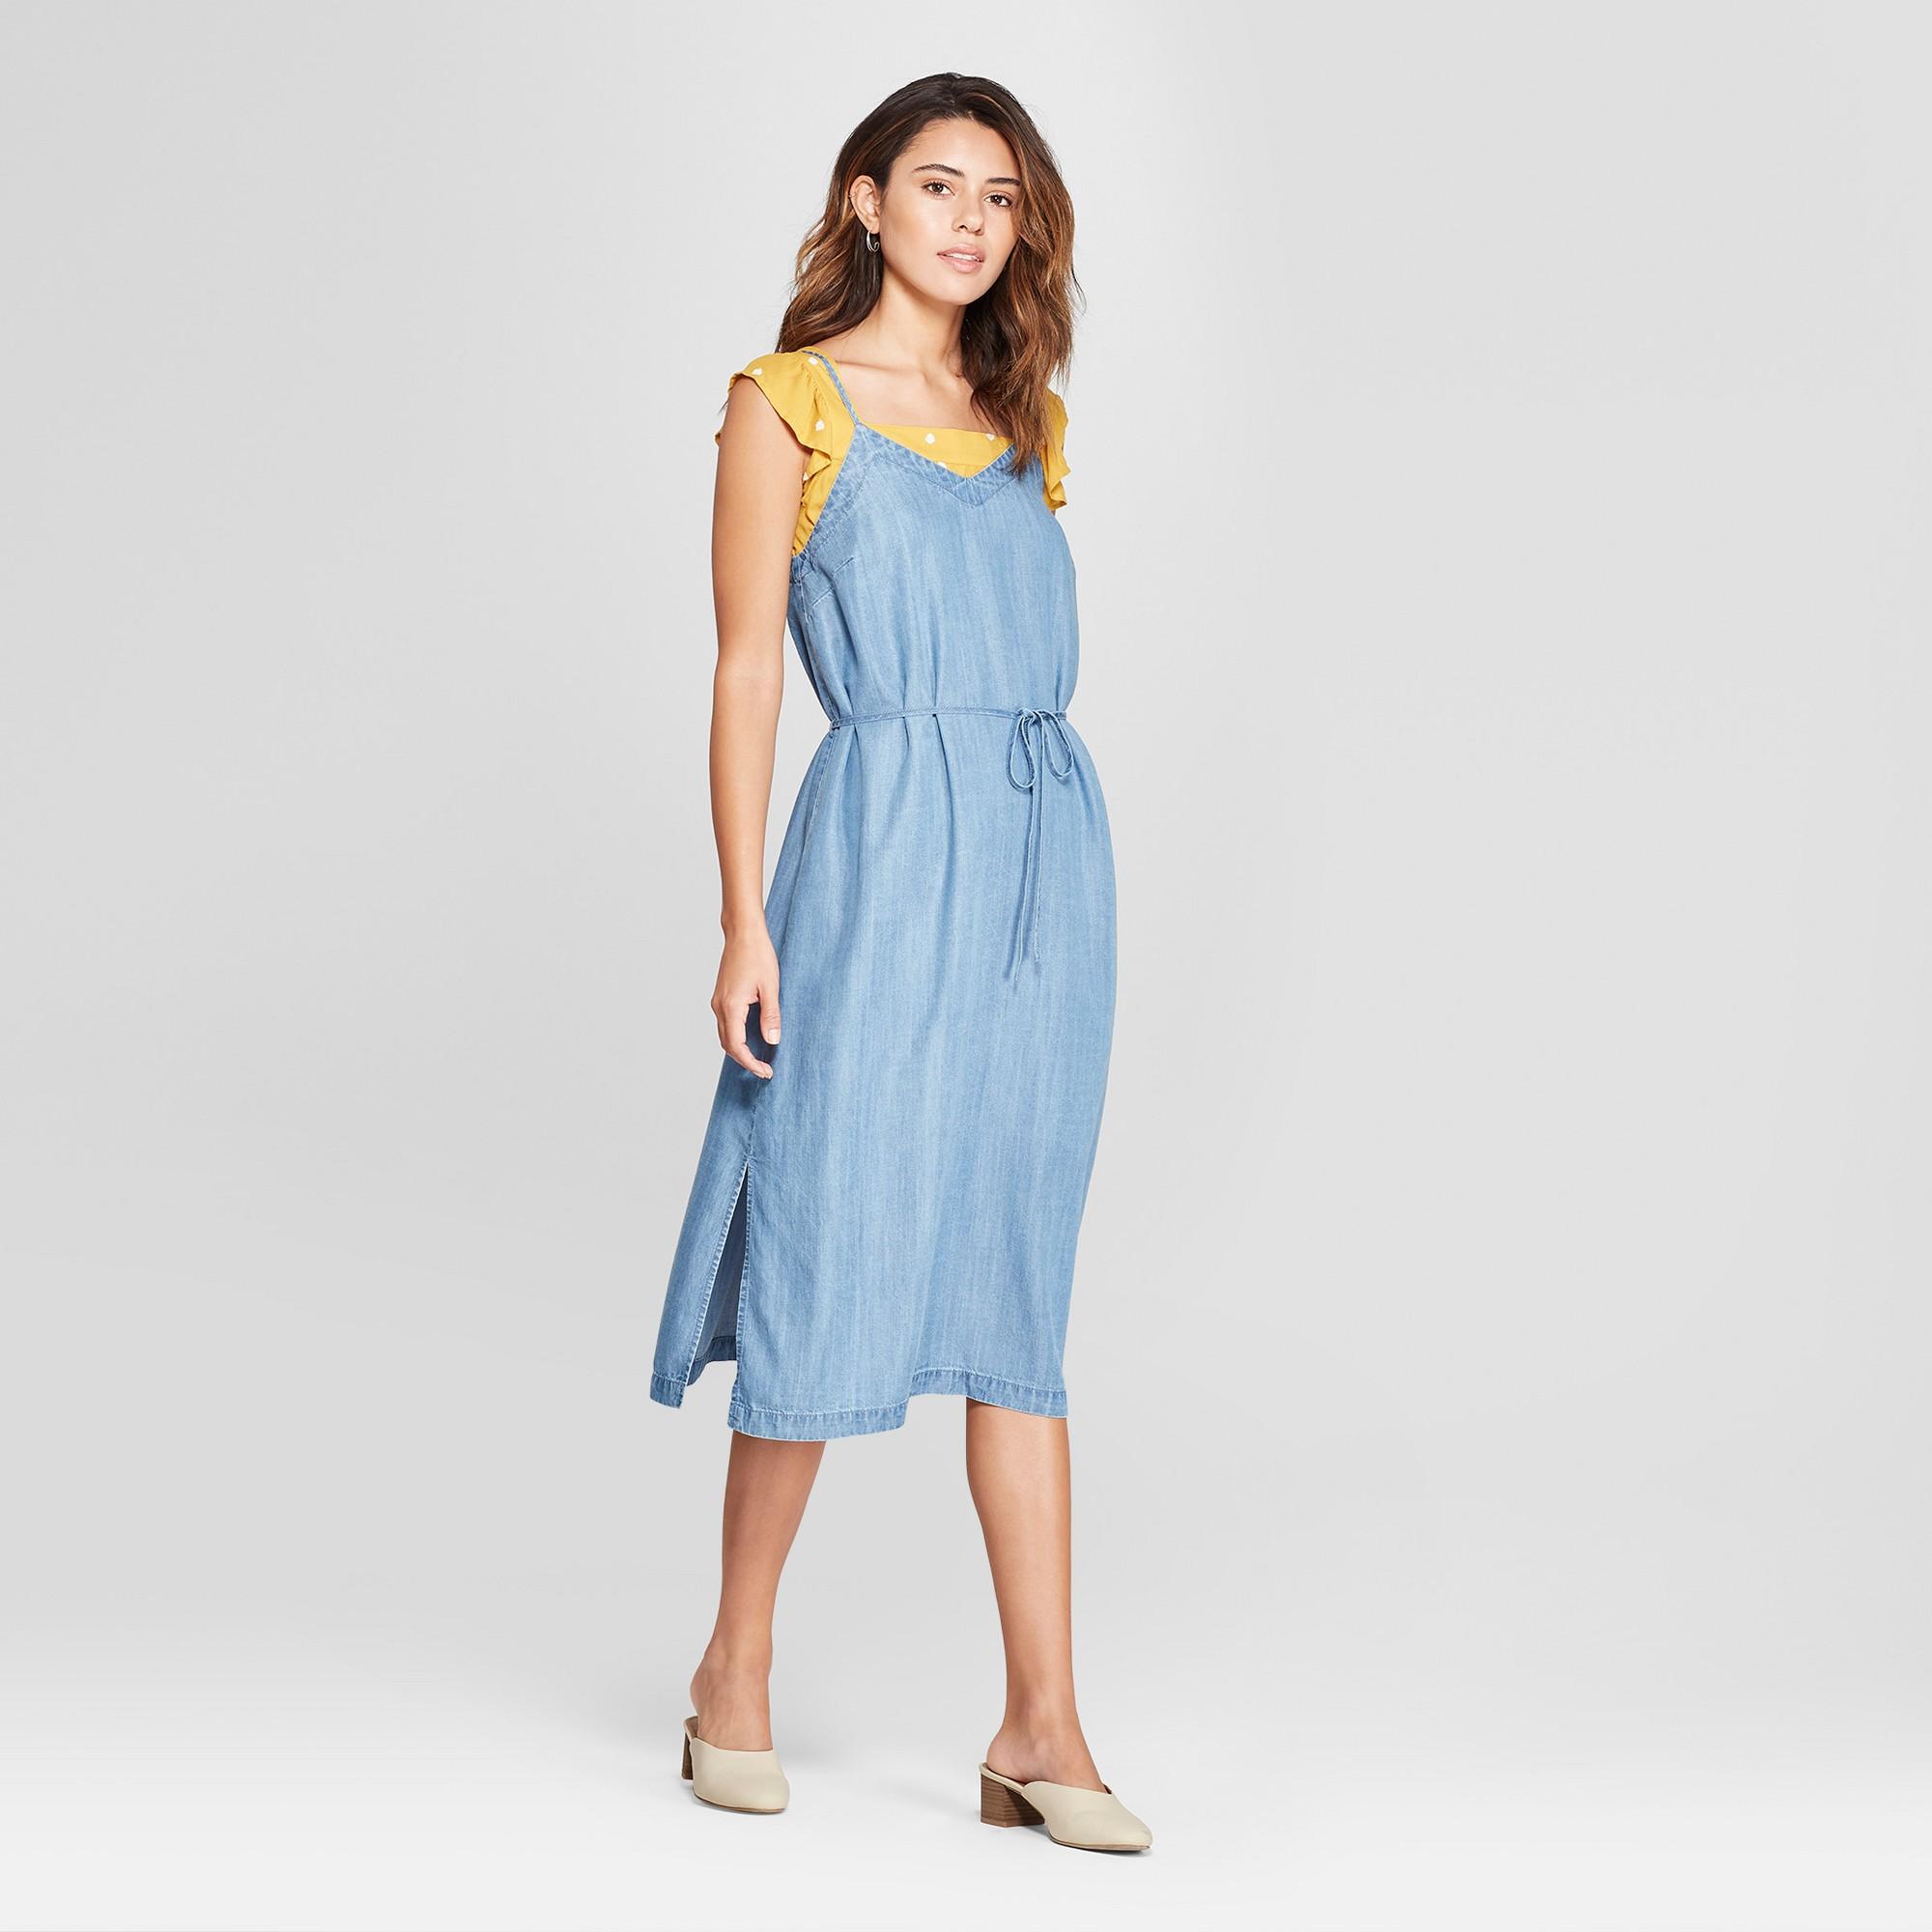 30bc9d04e3 Women s Denim Slip Dress - Universal Thread Medium Wash M